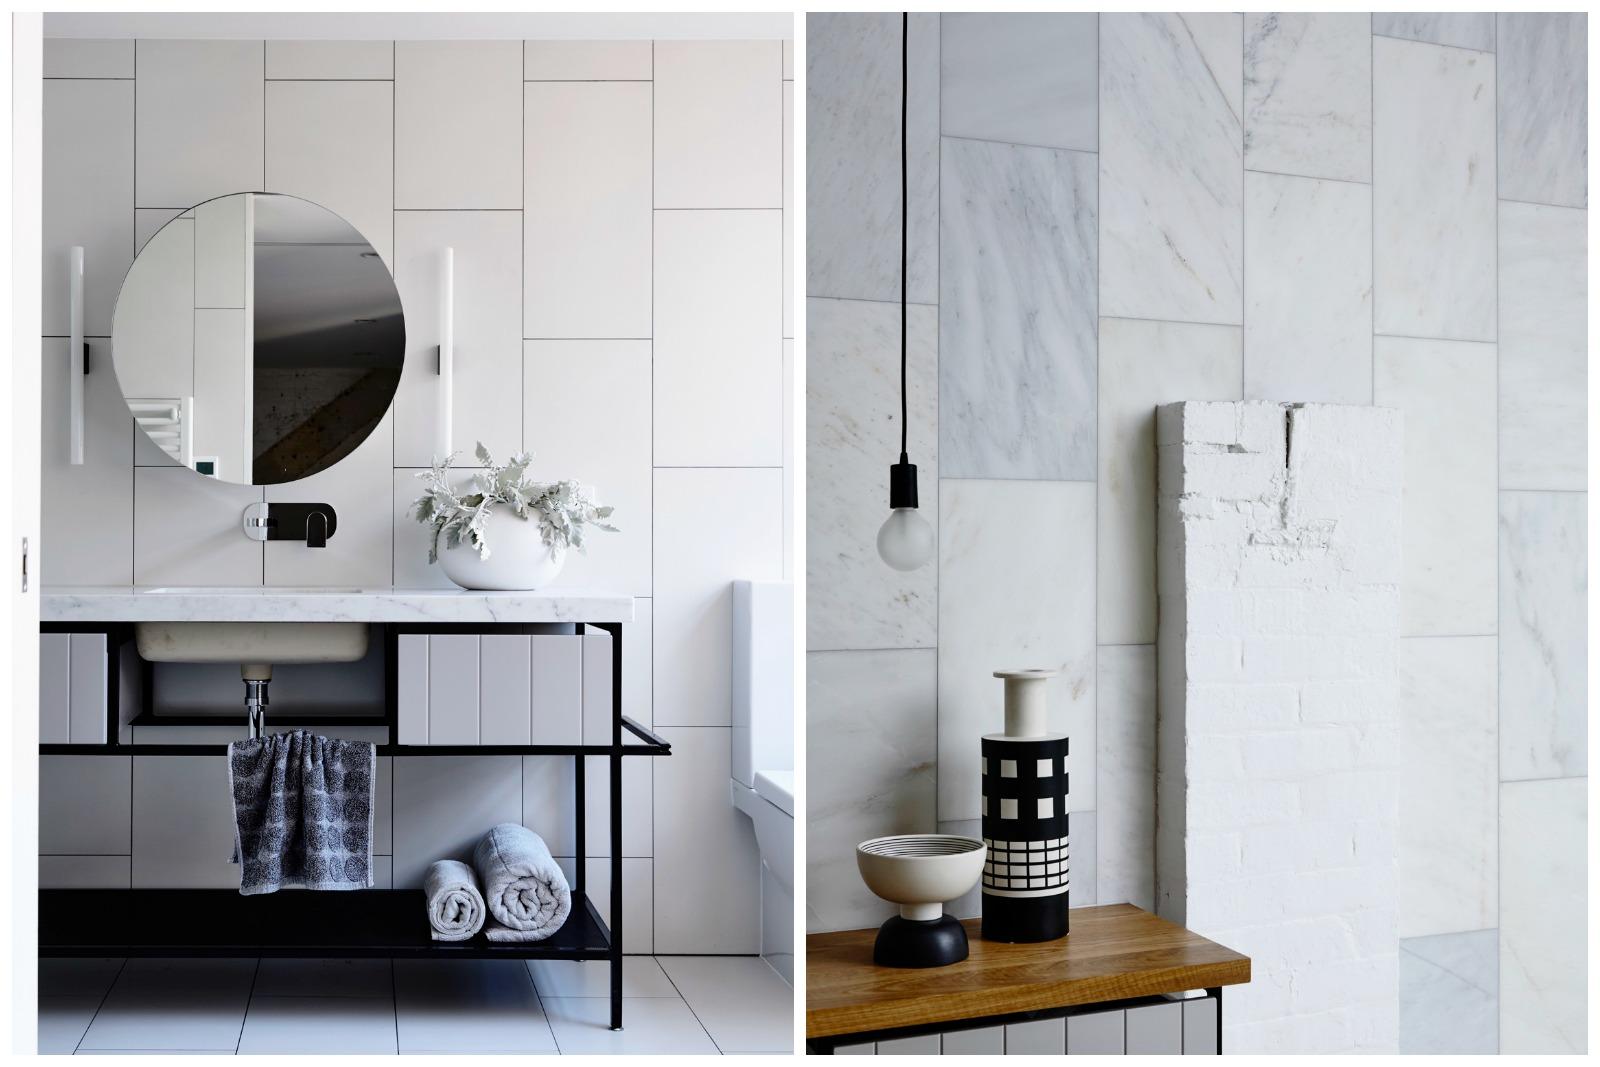 insustrial-style-bathroom-design.jpg